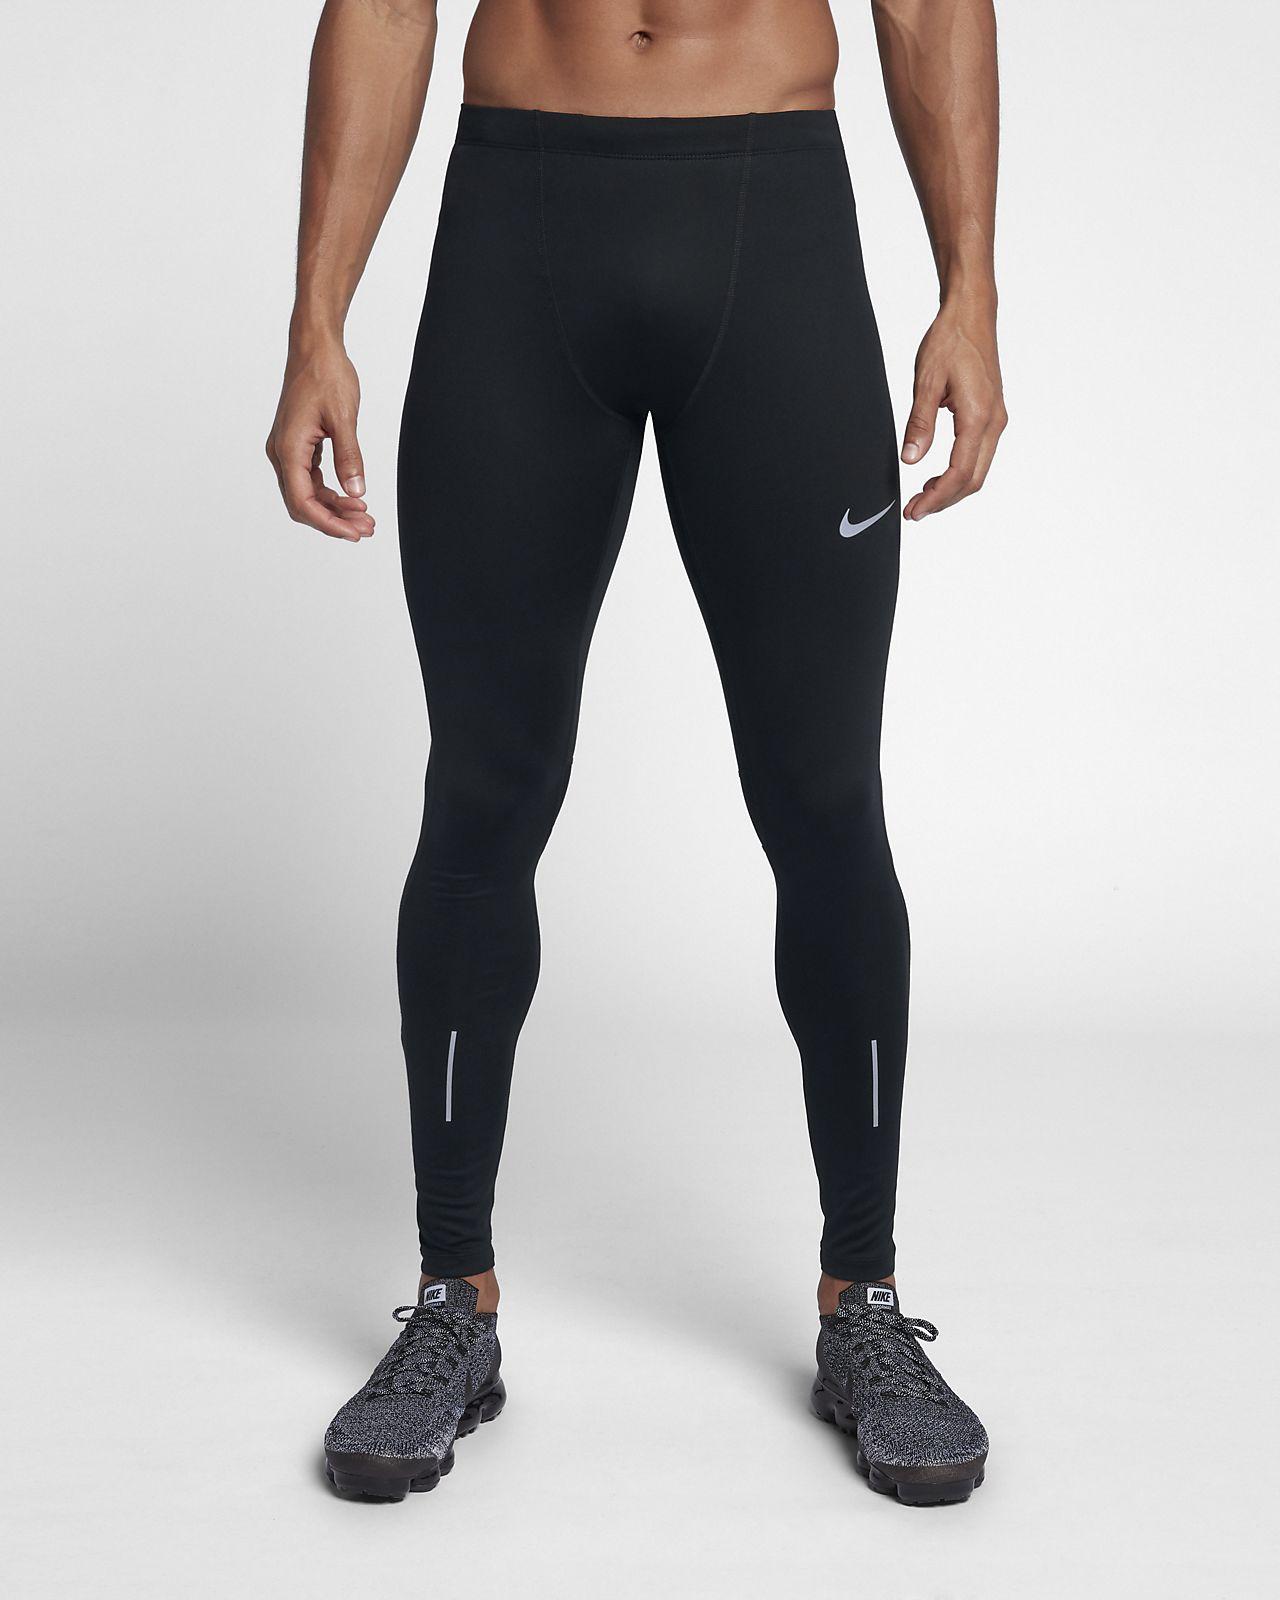 Męskie legginsy do biegania Nike Run 72,5 cm